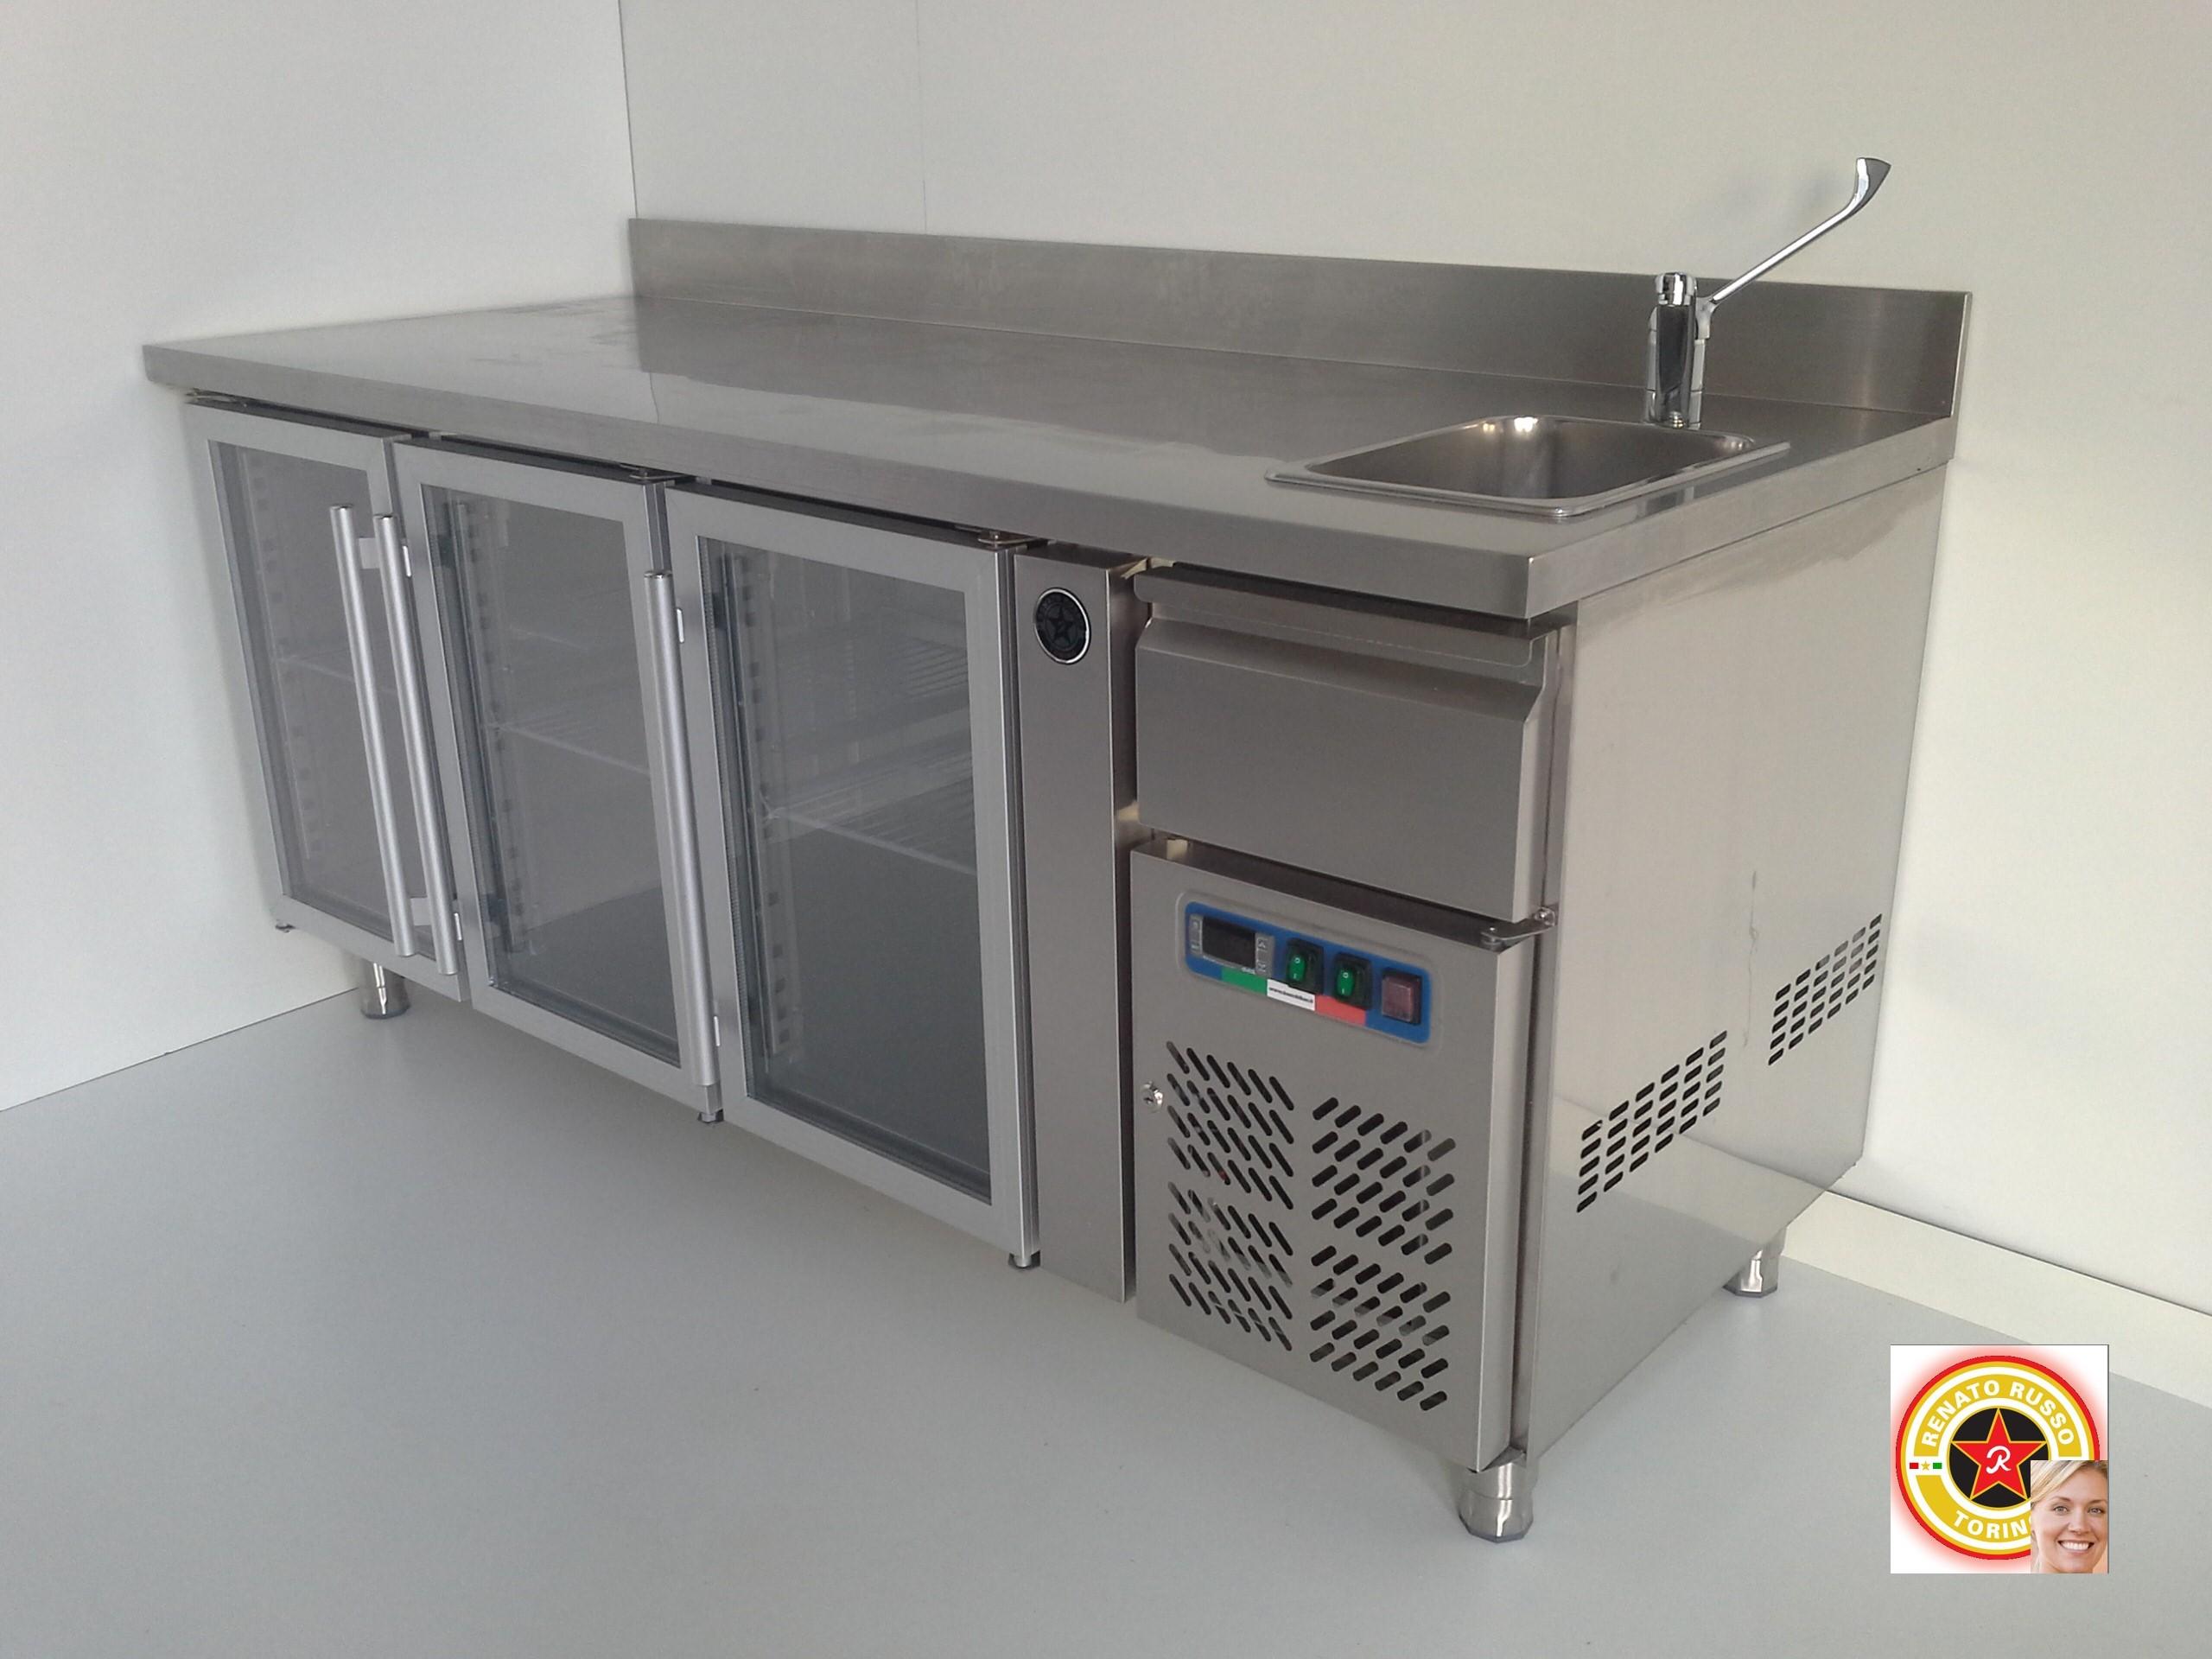 Banconi bar in promozione banchi frigo banconi bar banchi bar grezzi vetrine refrigerate - Frigo da tavolo usato ...